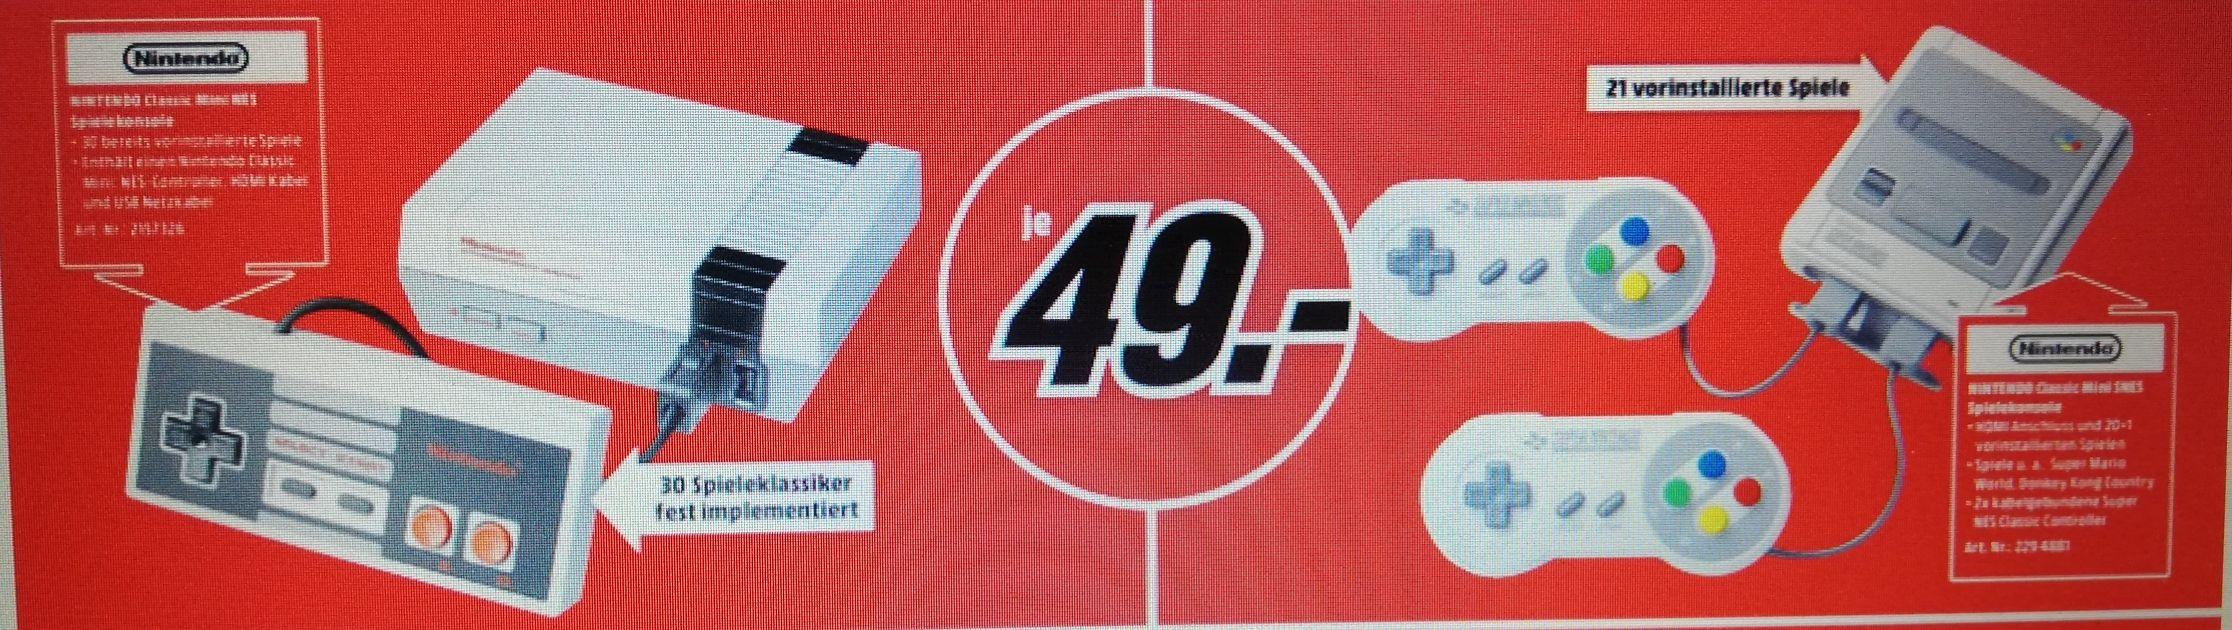 Nintendo Classic Mini SNES & Nintendo Classic Mini NES für je 49€ (Lokal Mediamarkt Neunkirchen)